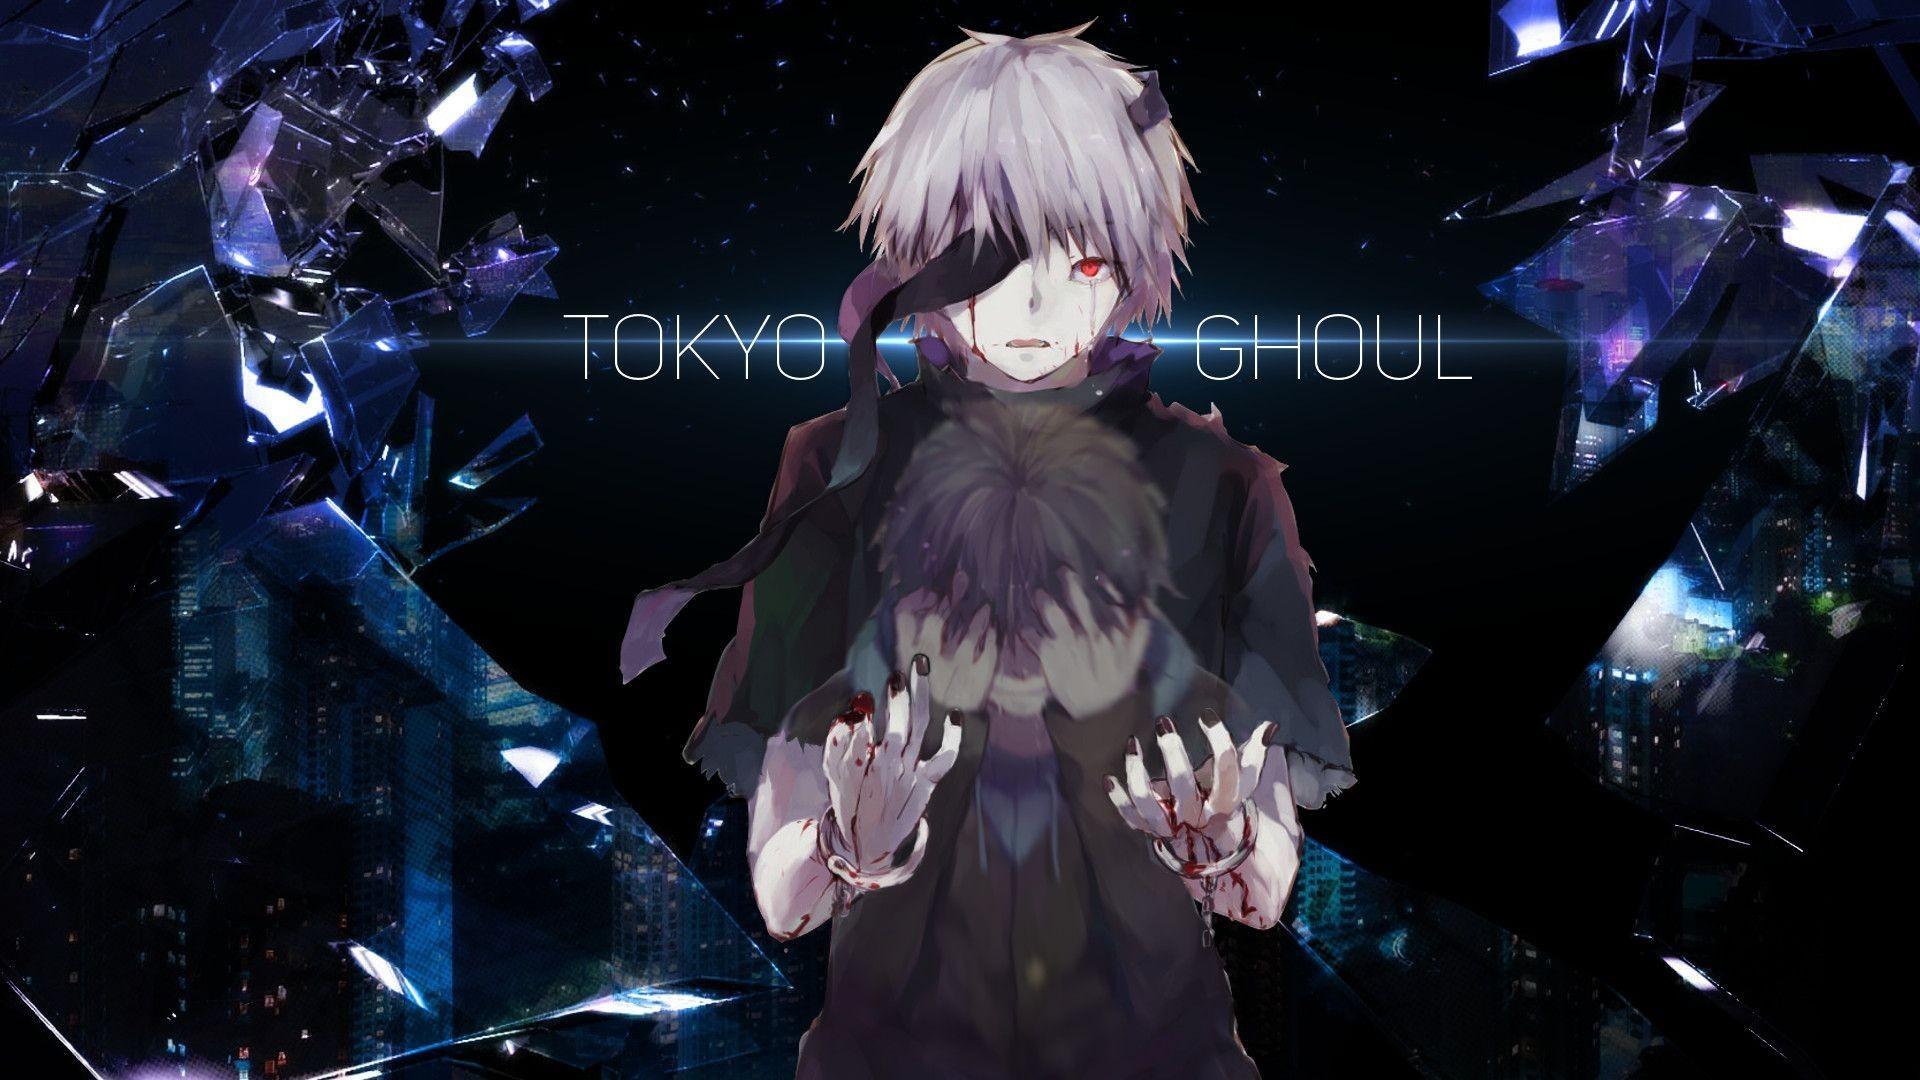 Tokyo Ghoul Wallpaper – Kaneki Ken by StellaTheCat12 on DeviantArt